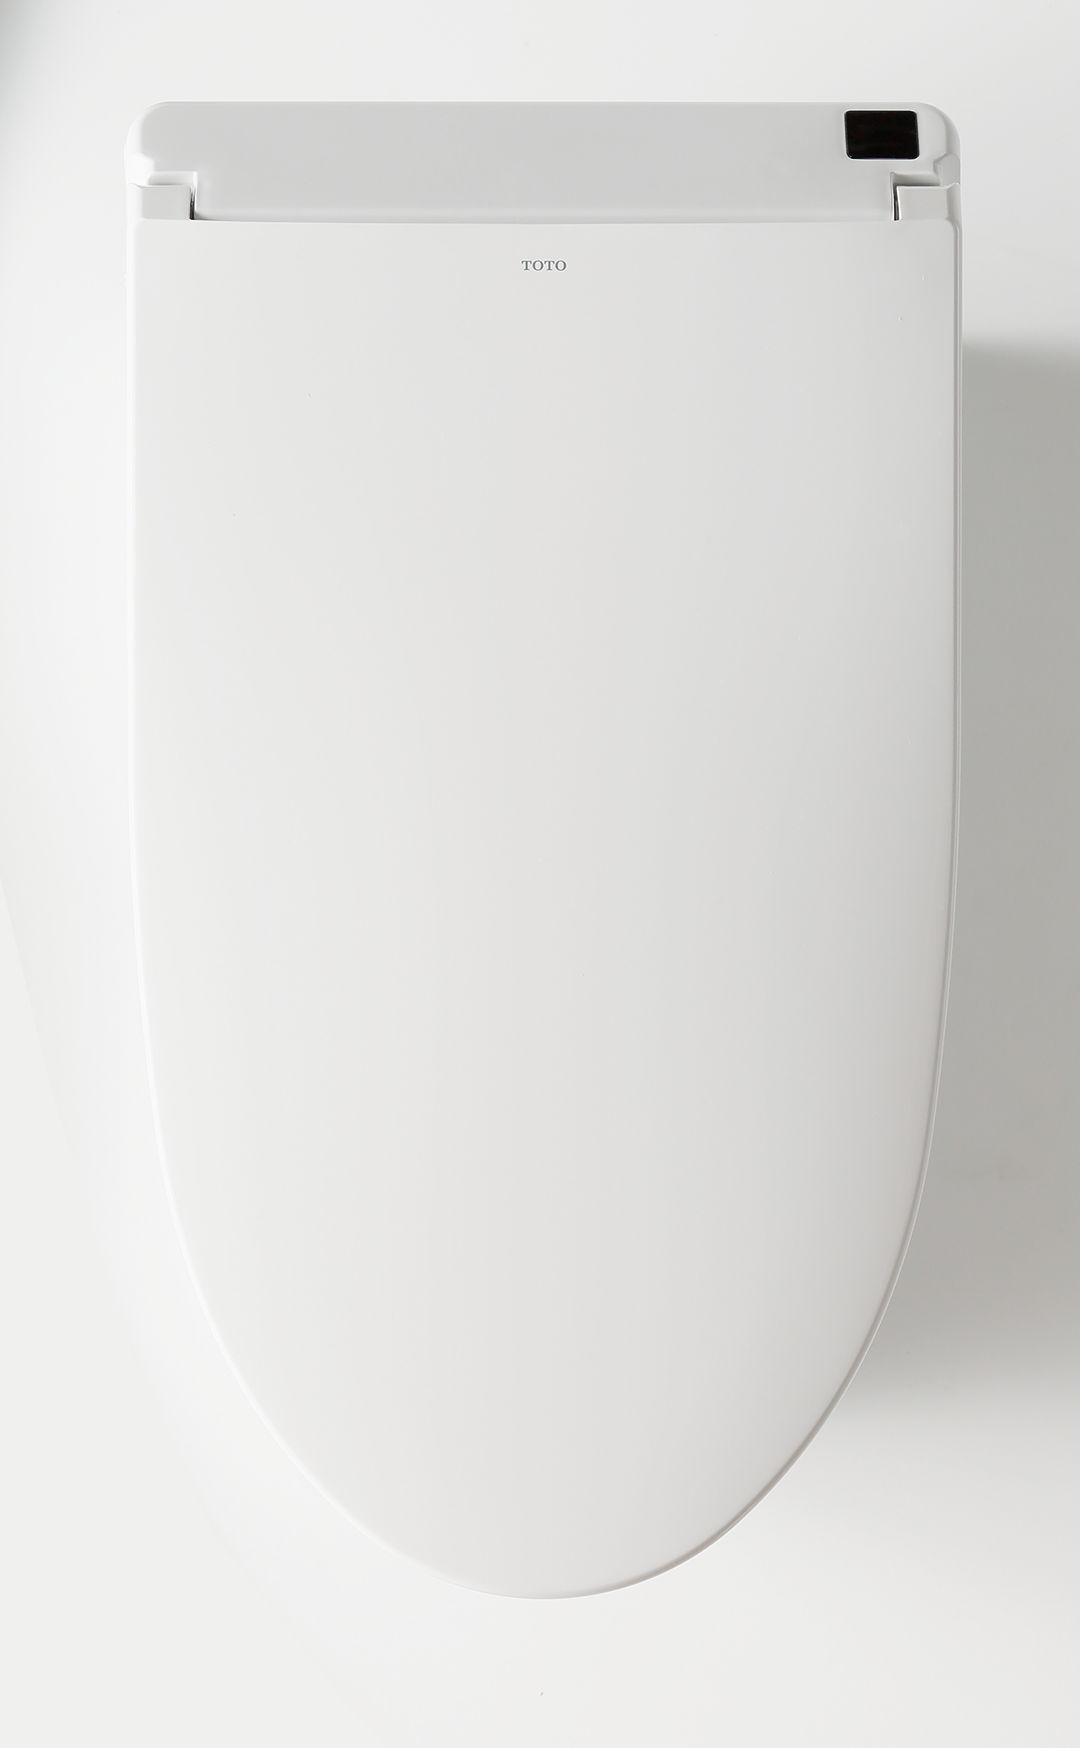 NEOREST® AH Dual Flush Toilet - 1.0 GPF & 0.8 GPF - TotoUSA.com